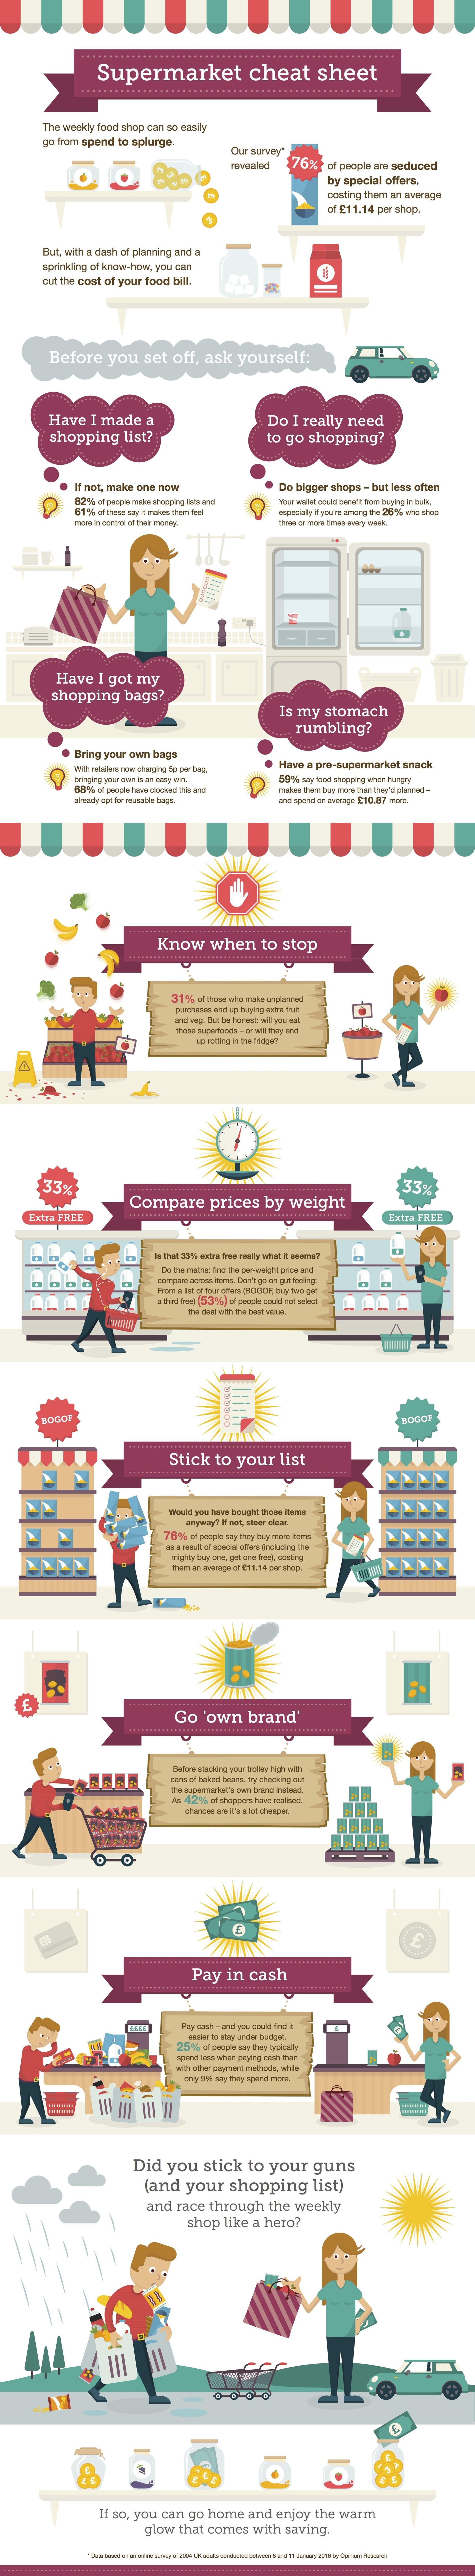 6-5-16 supermarket hacks money advice service